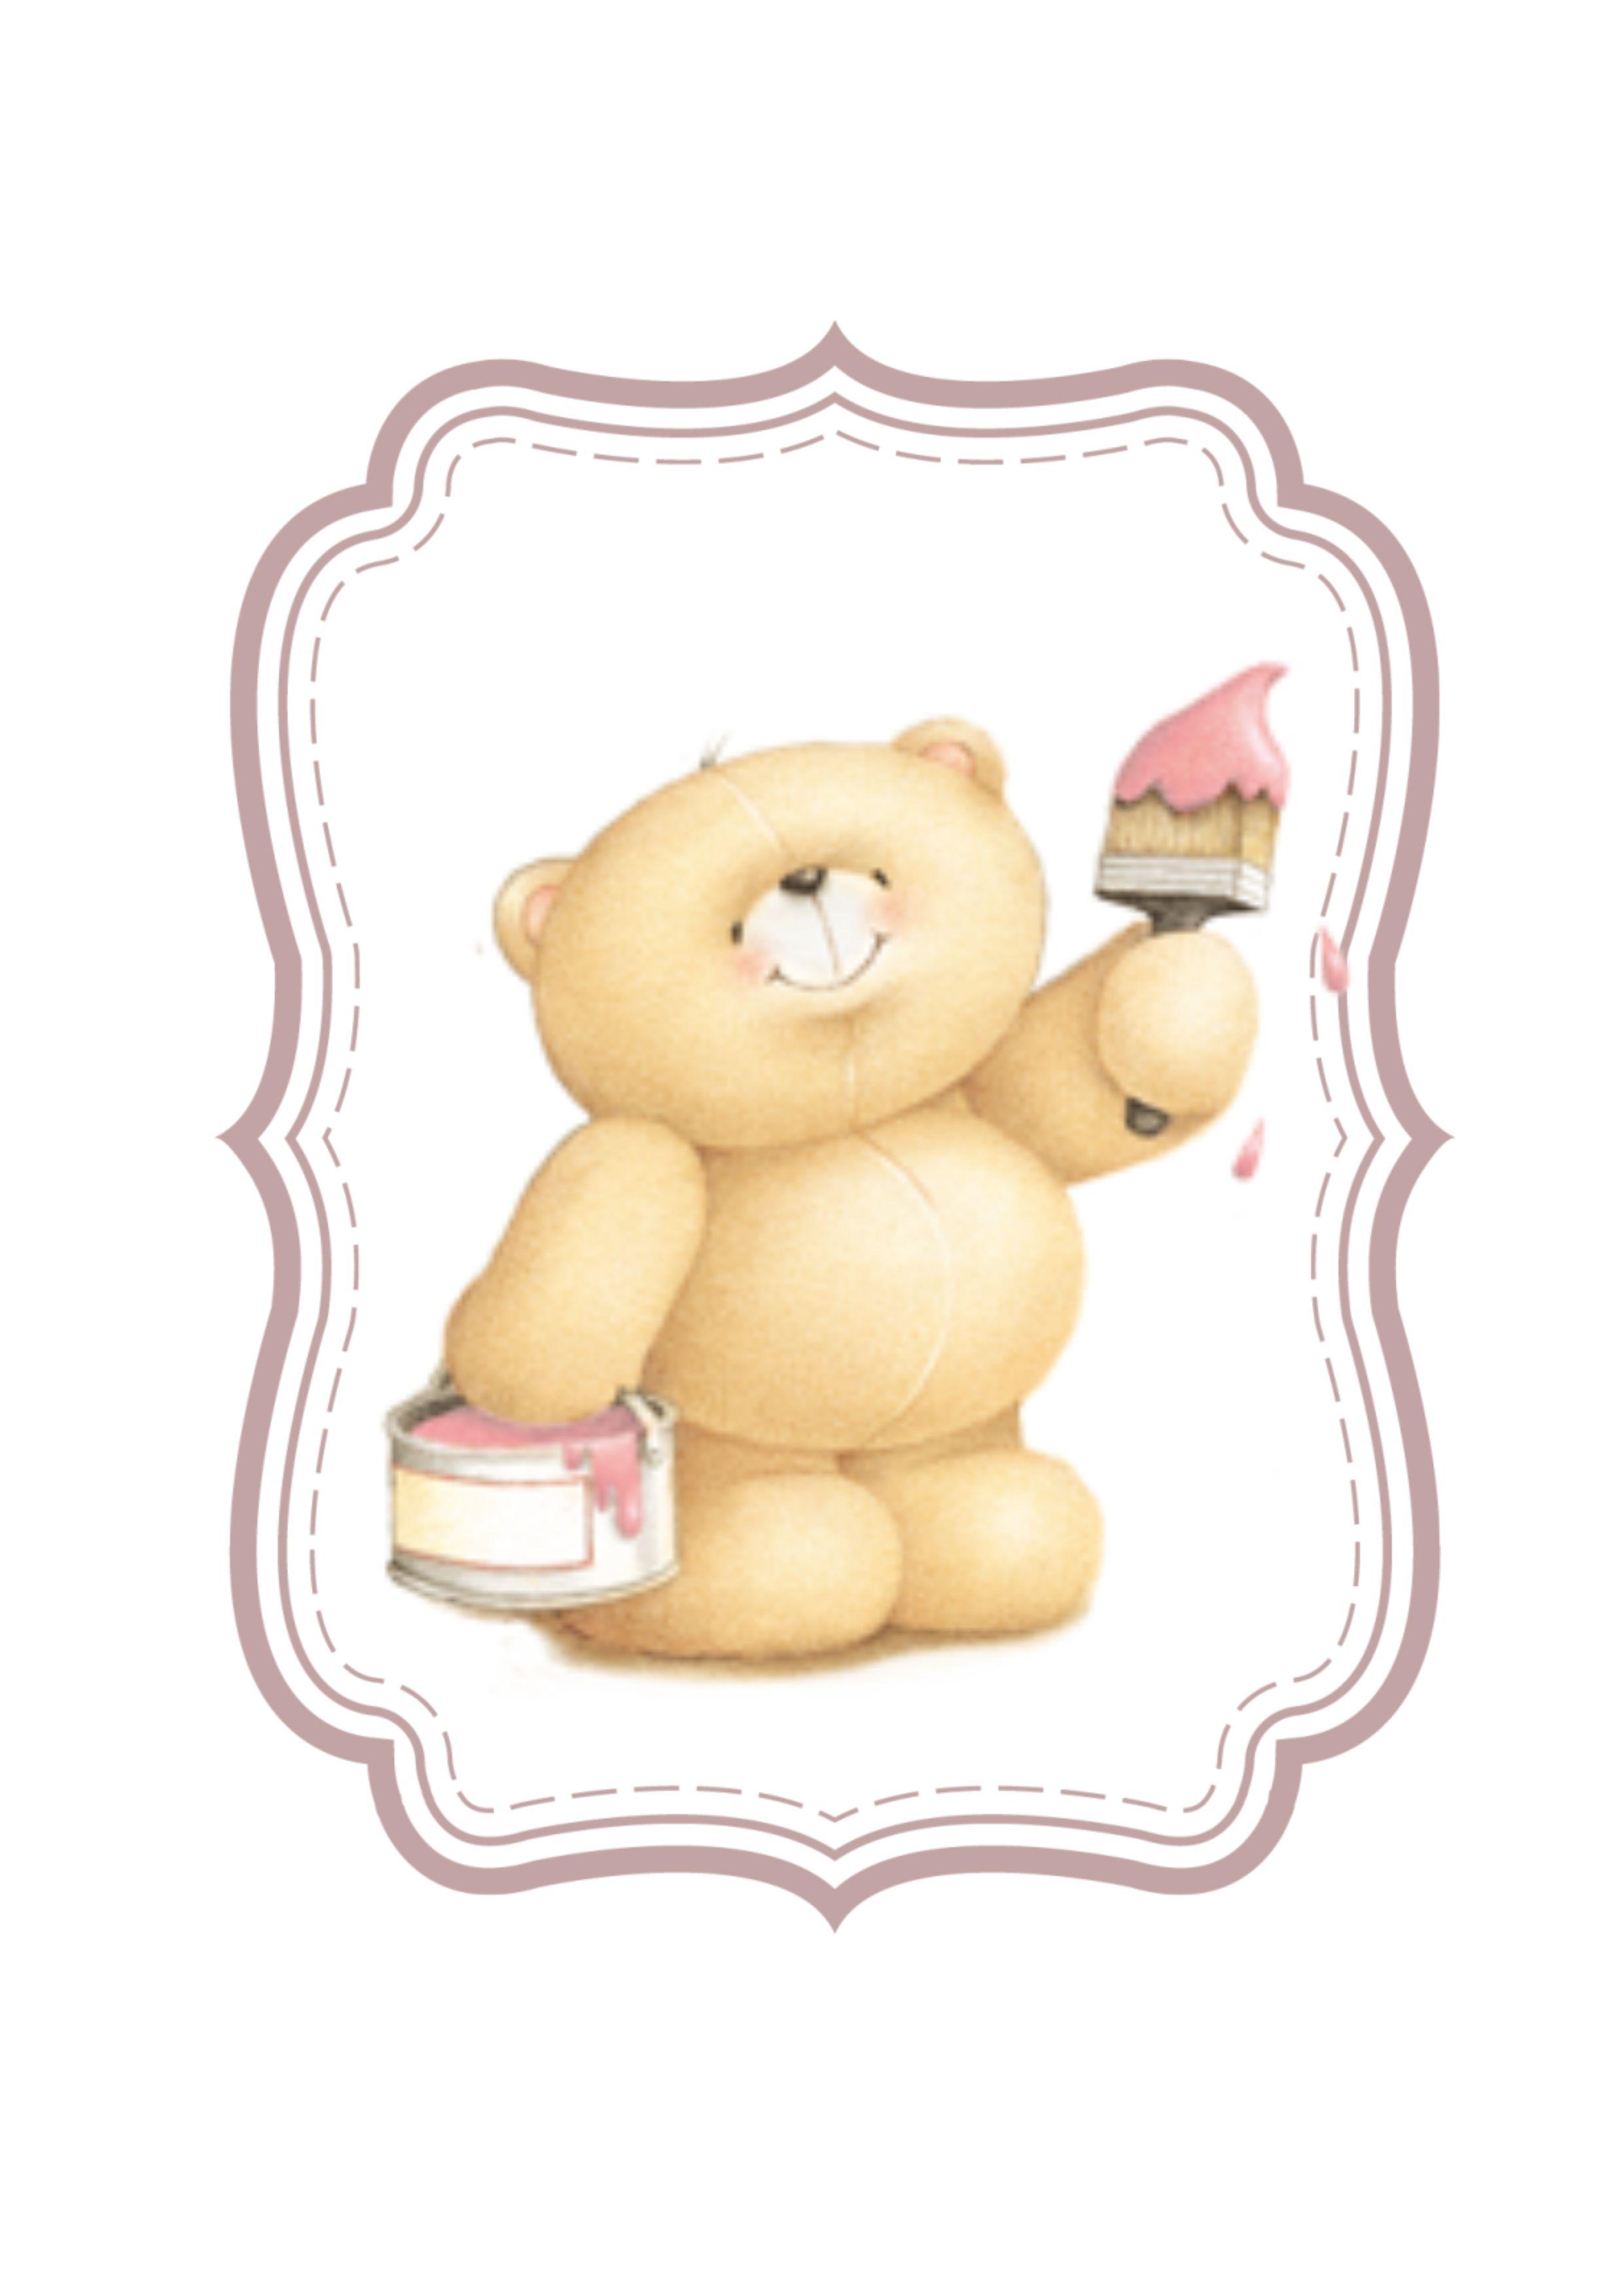 Forever friends nios pinterest bears teddy bear and tatty forever friends friends foreverteddy bearstatty fandeluxe Ebook collections